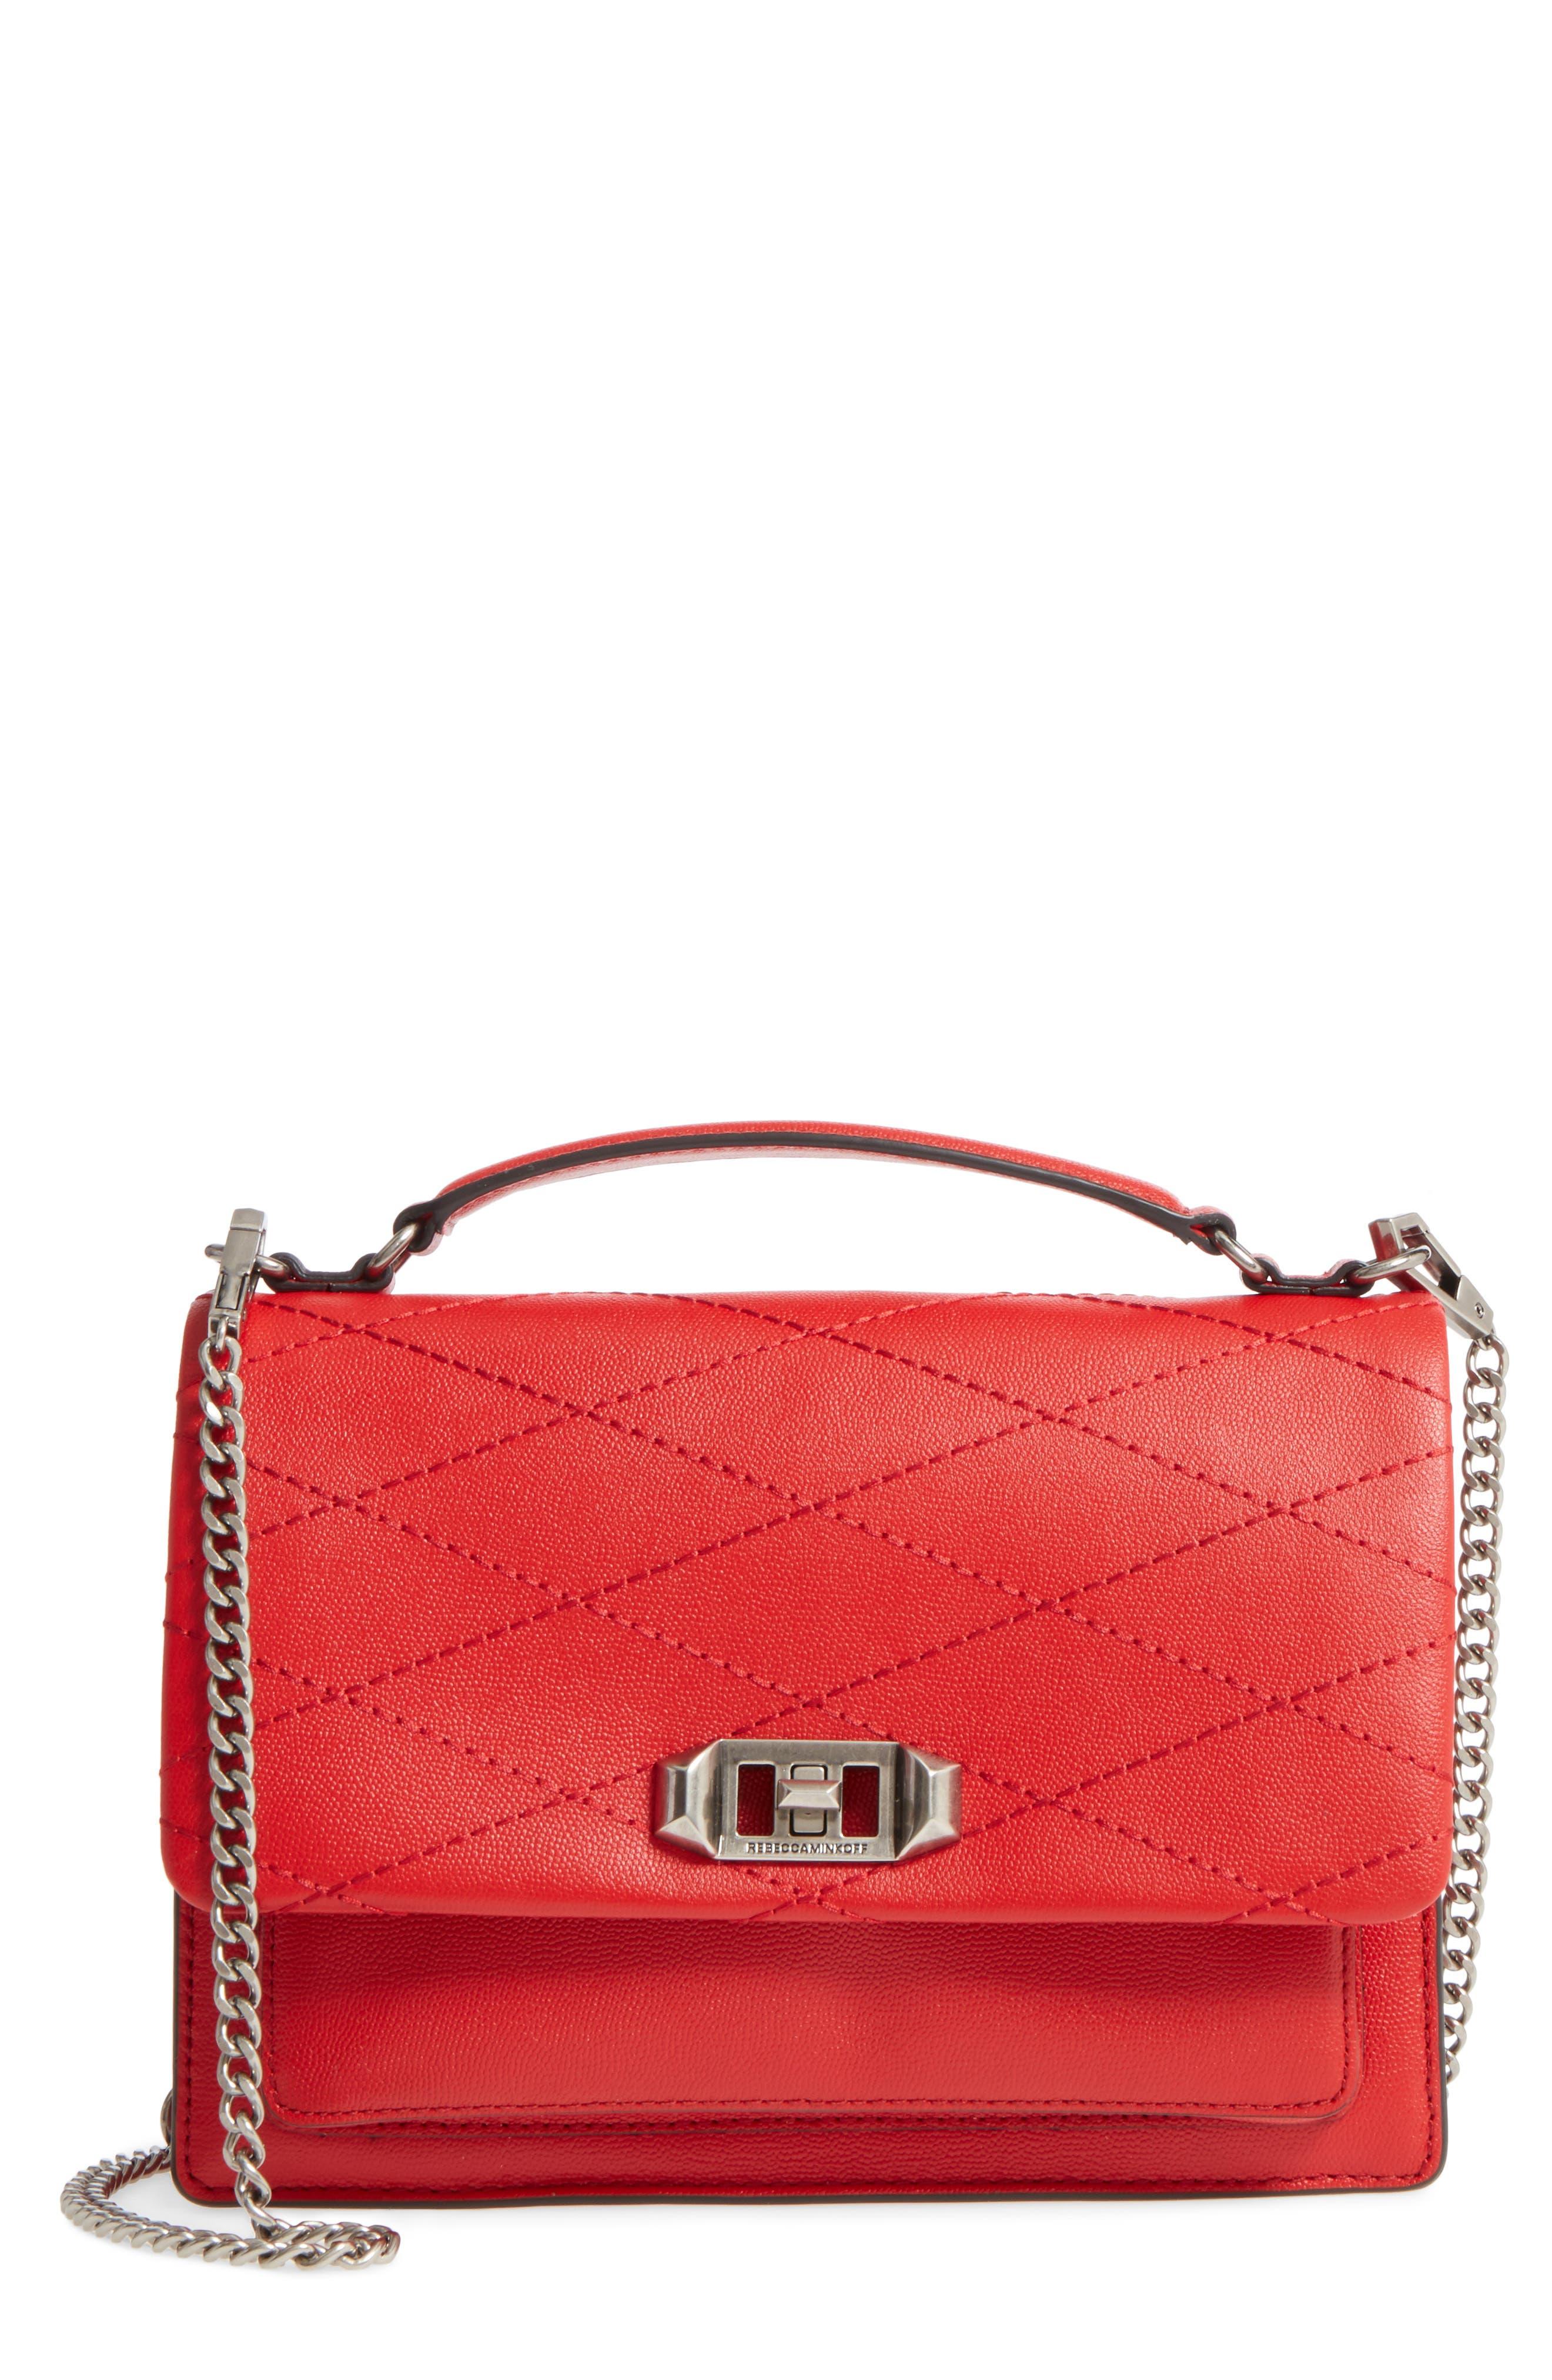 Alternate Image 1 Selected - Rebecca Minkoff Medium Je T'aime Convertible Leather Crossbody Bag